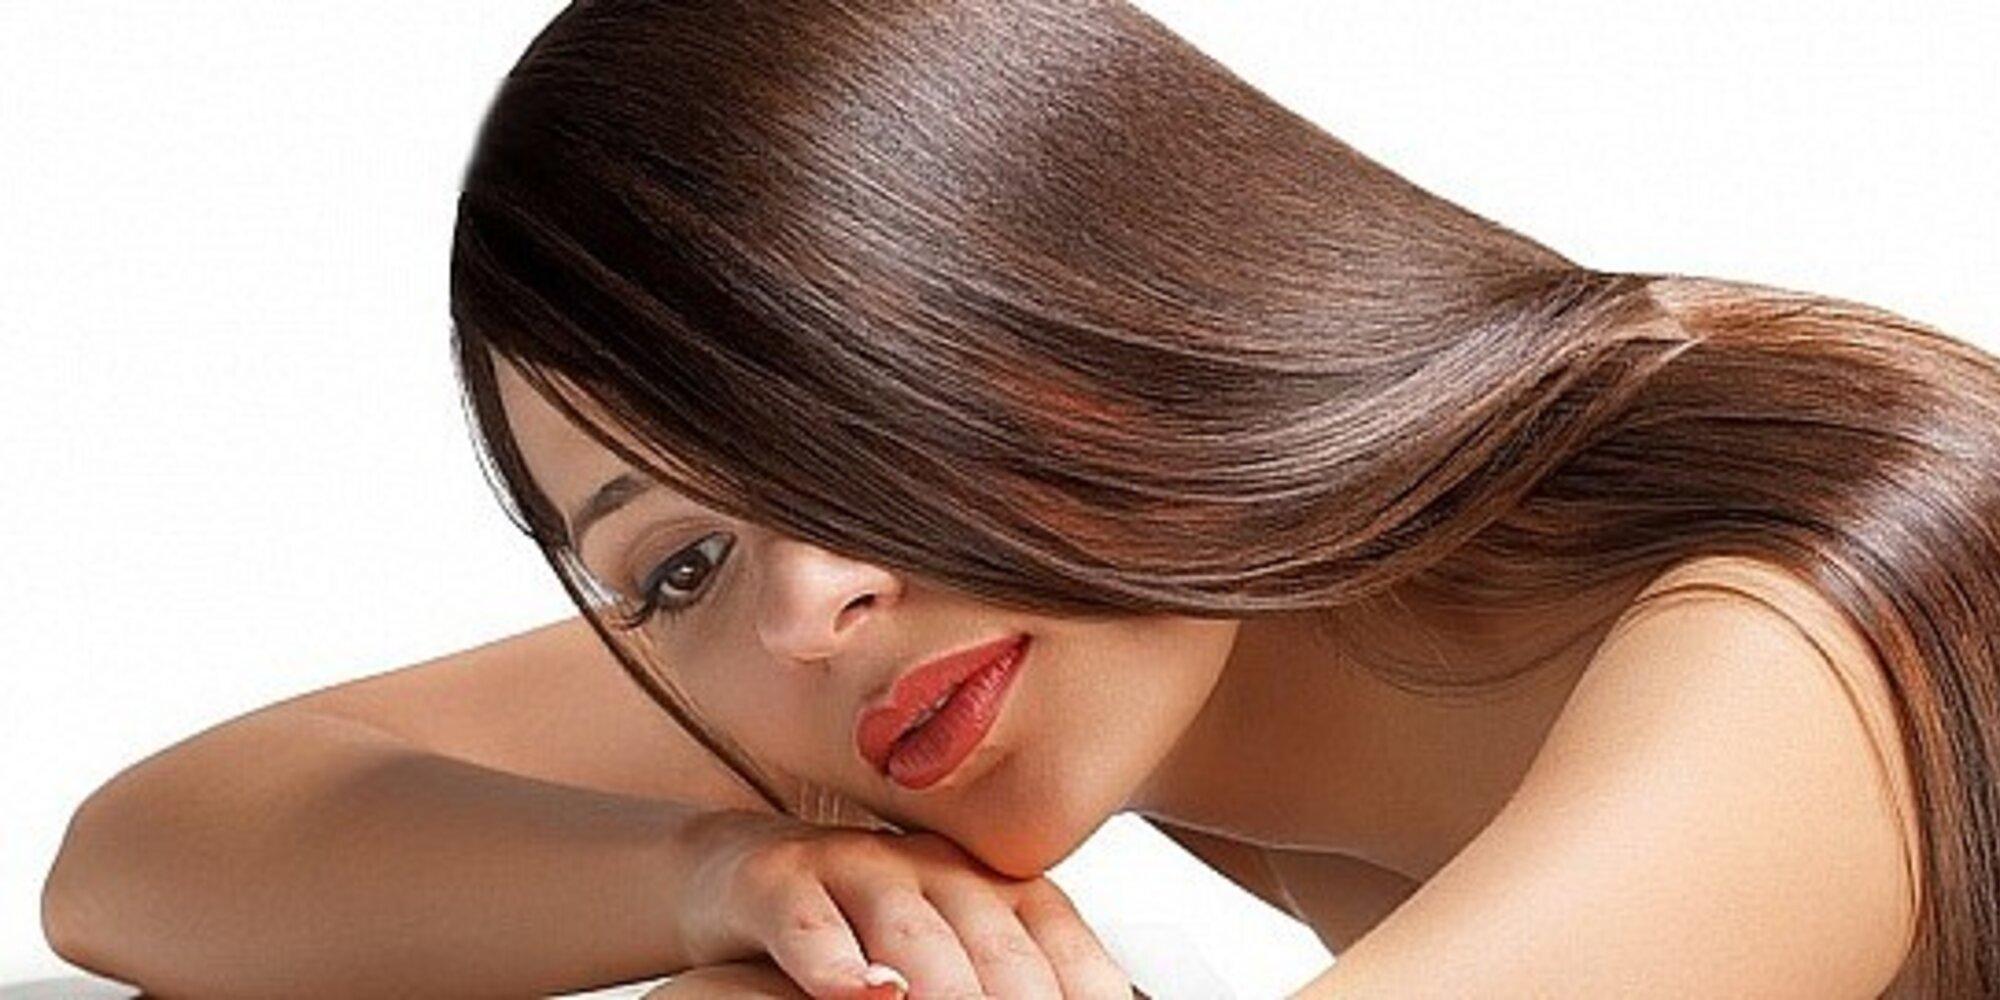 кератиновый уход для волос HAIR SPA KERATIN —Greymy Professional.